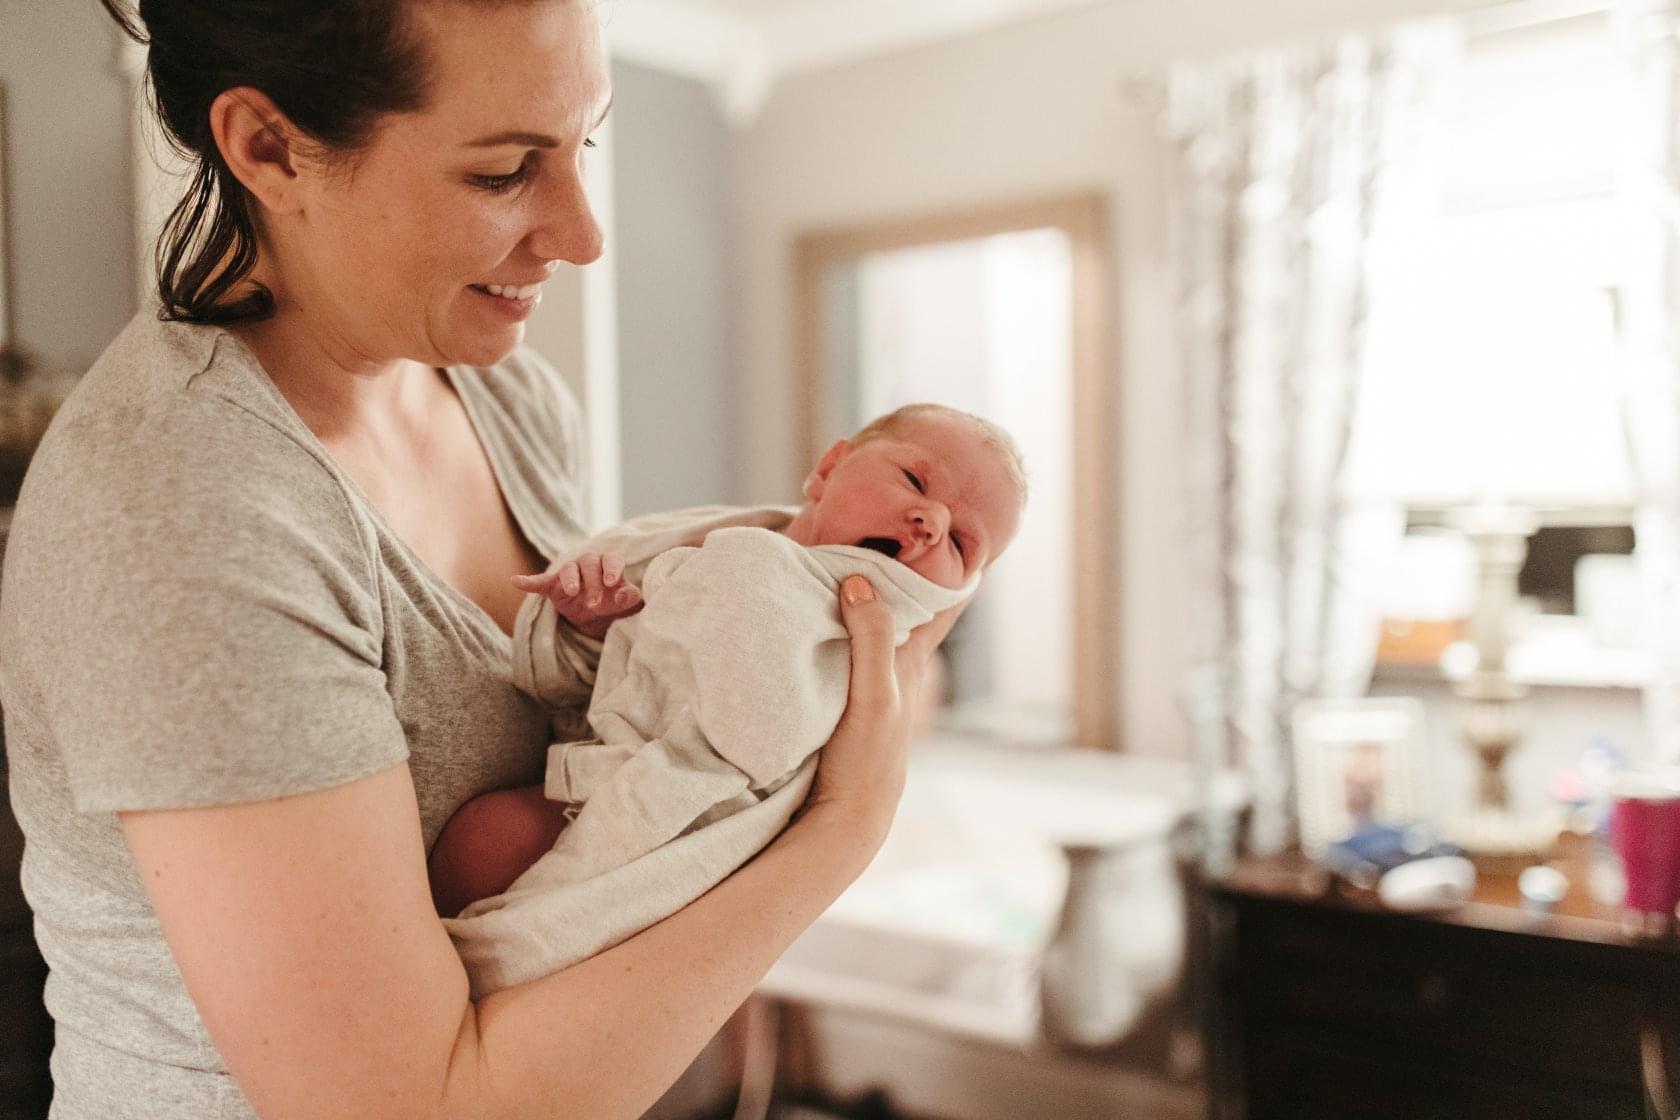 heather holding baby